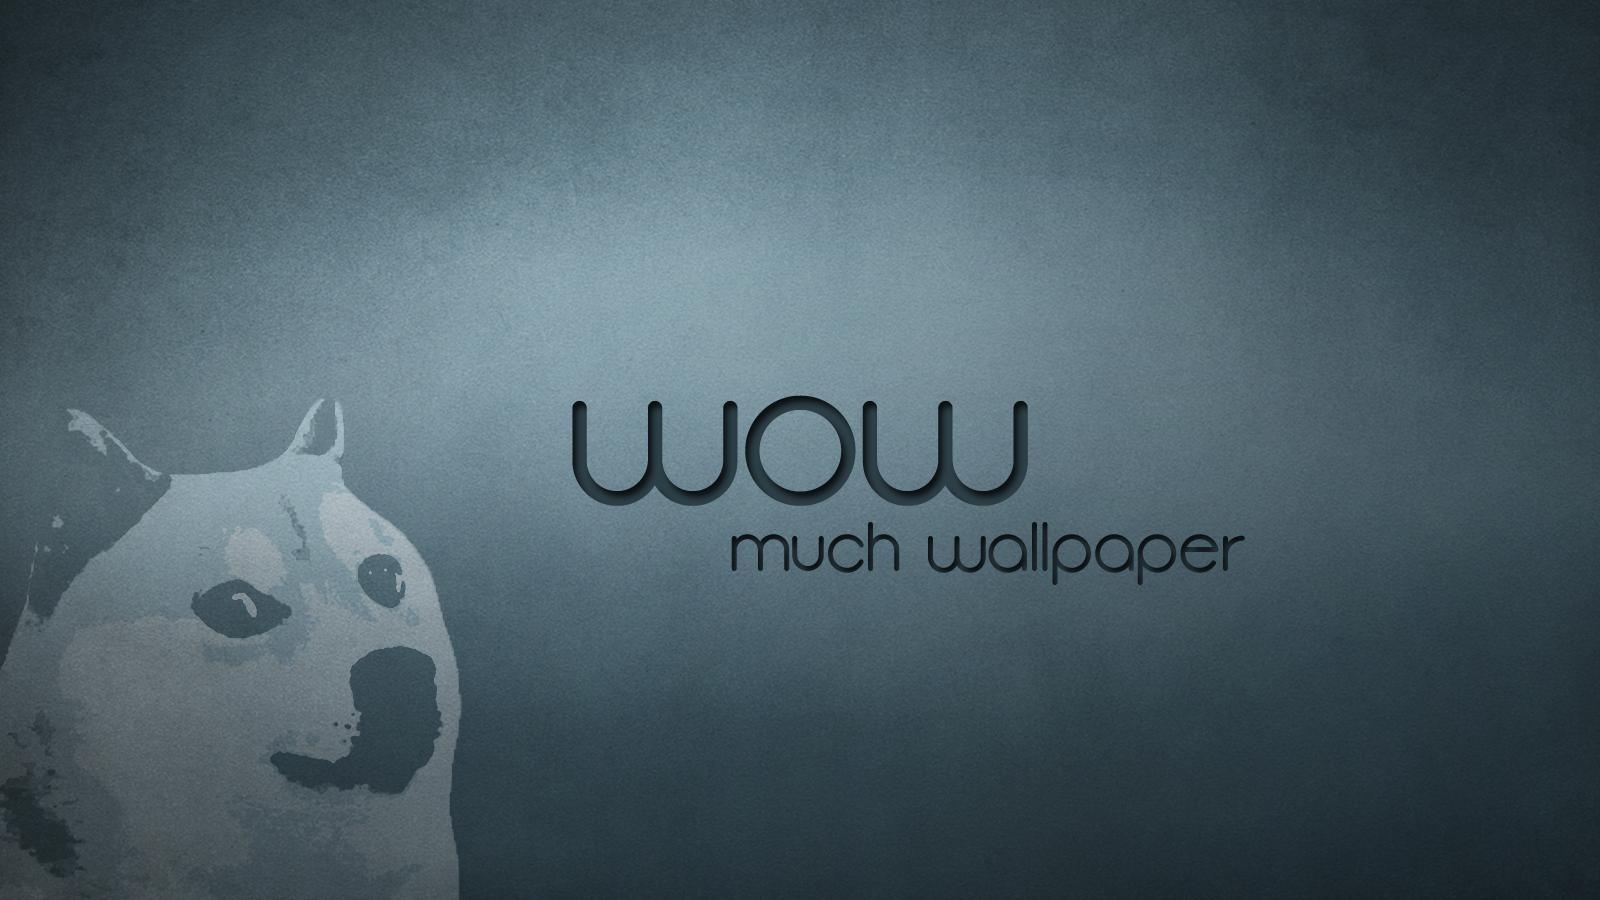 Wow Such Wallpaper   Doge Wallpaper 1600x900 18371 1600x900